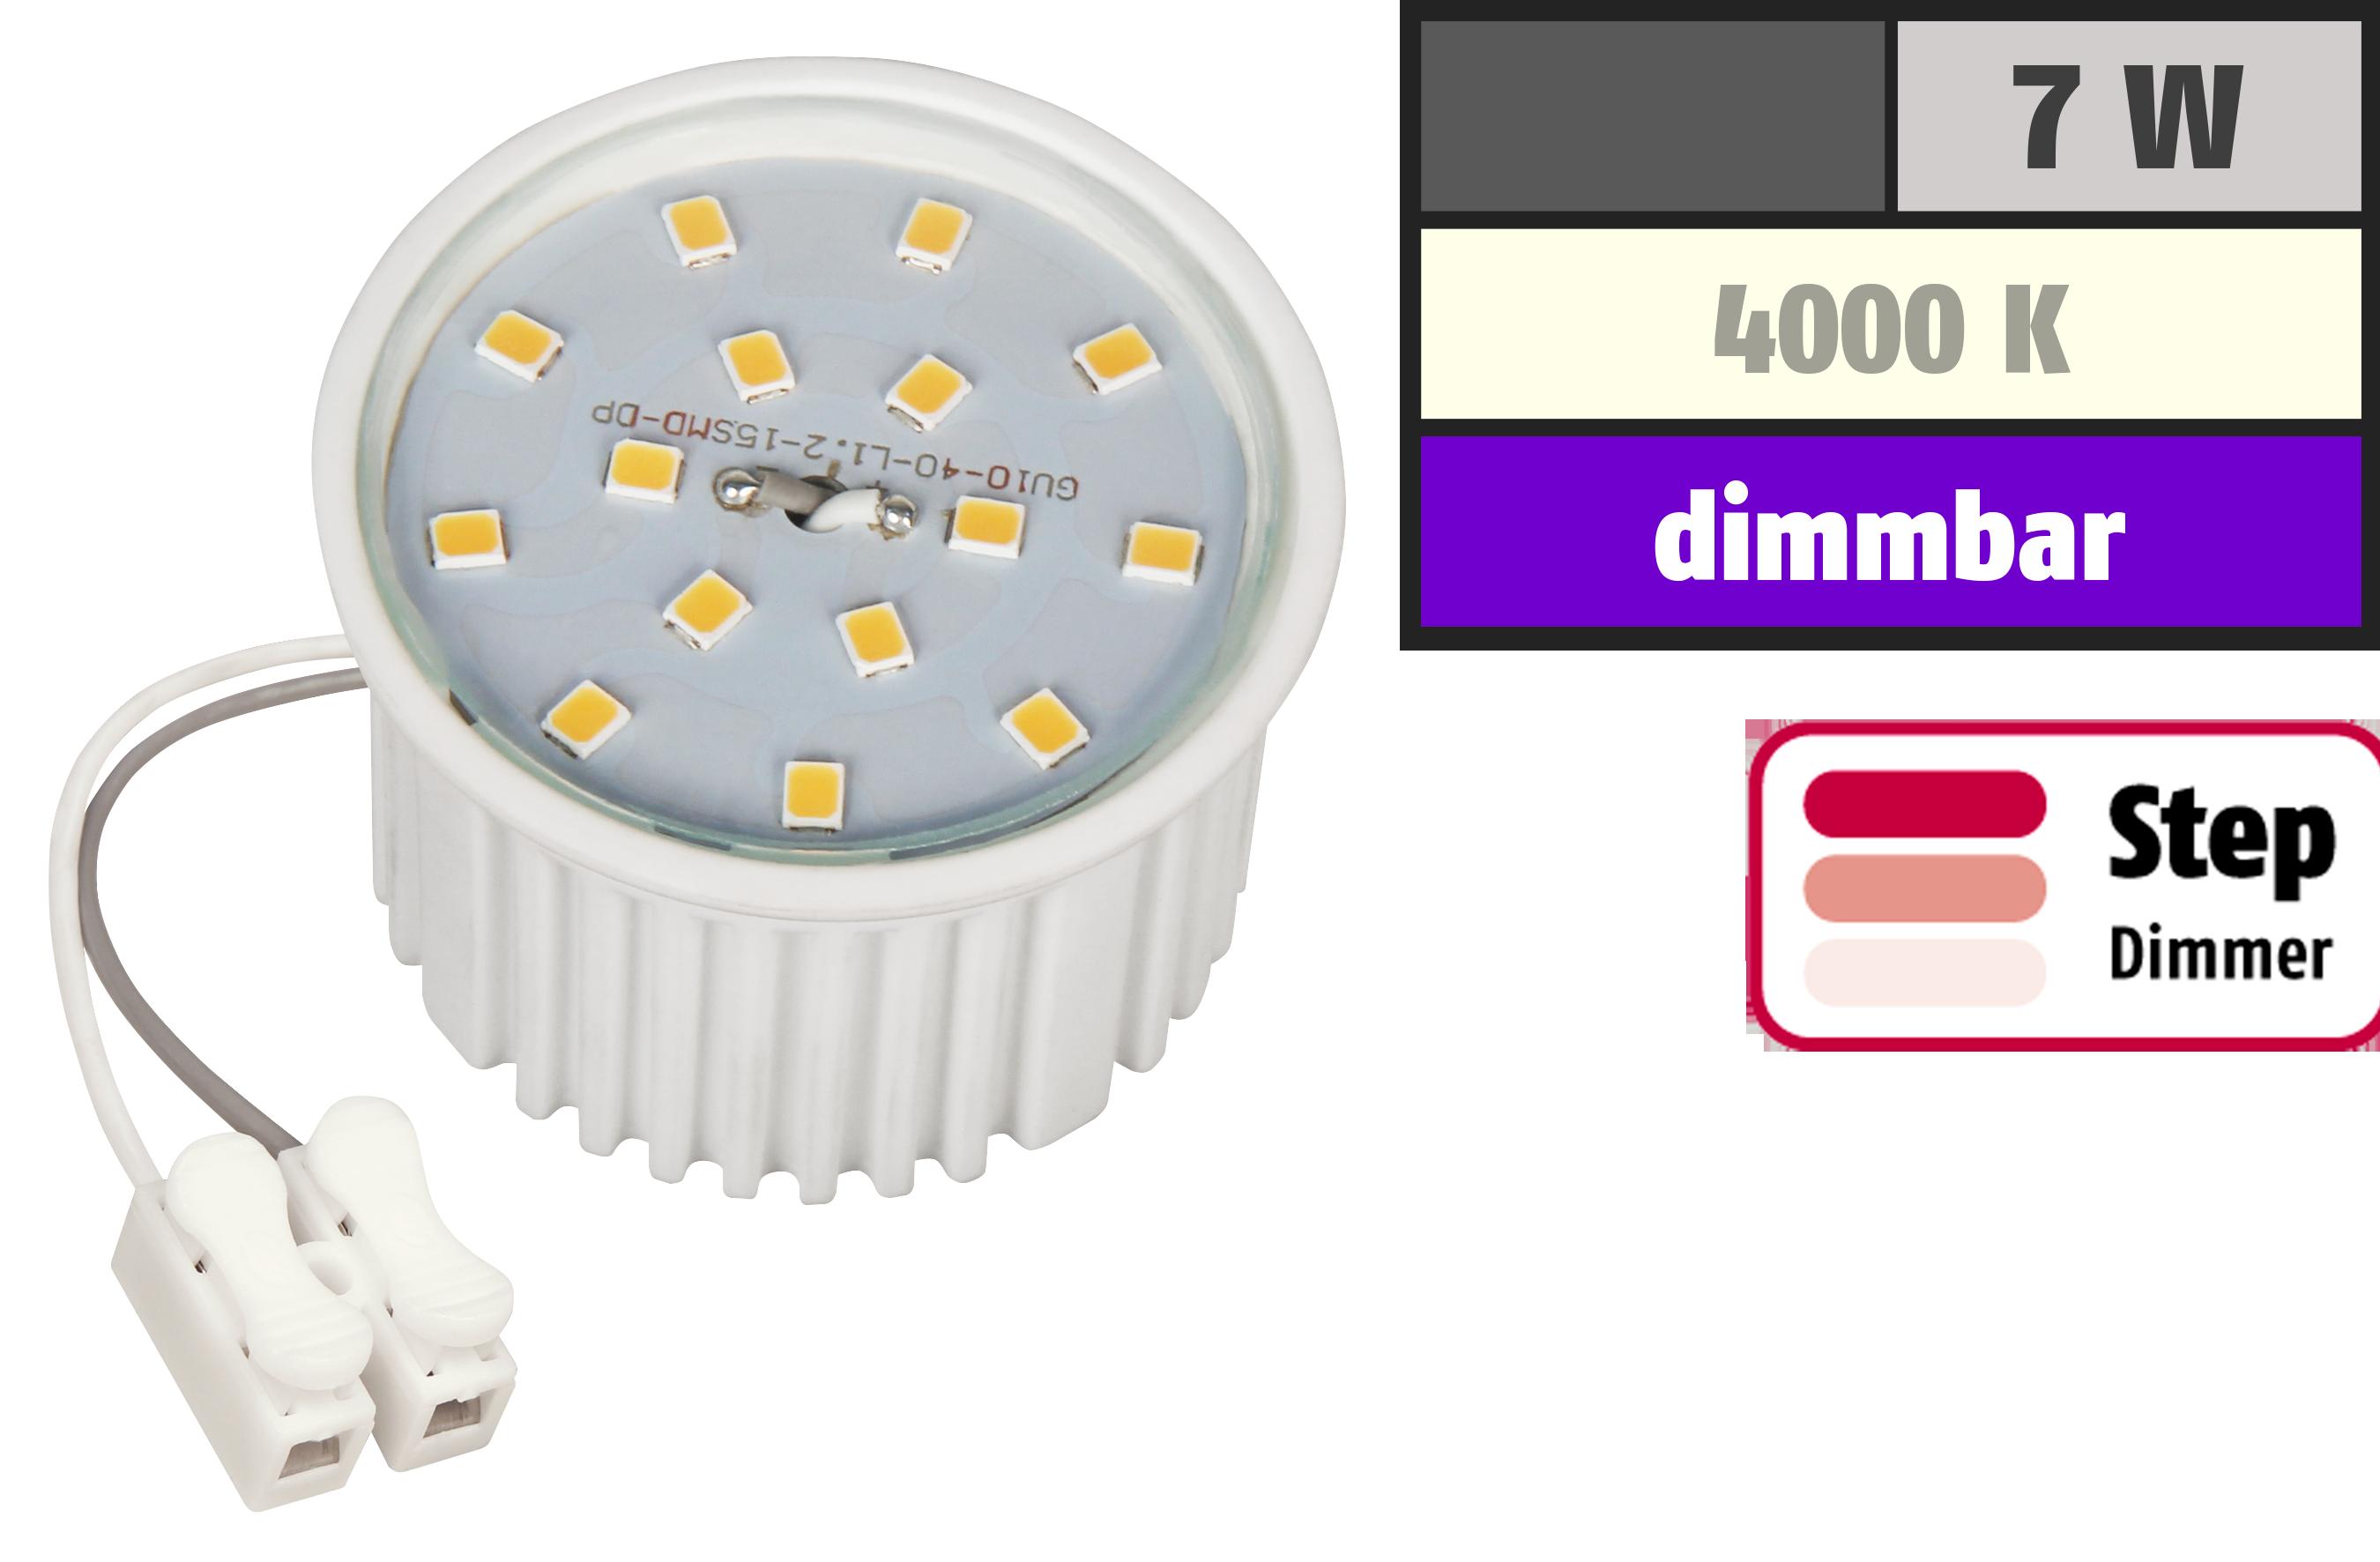 LED-Modul McShine, 7W, 510 Lumen, 230V, 50x33mm, neutralweiß, 4000K,step-dimmbar